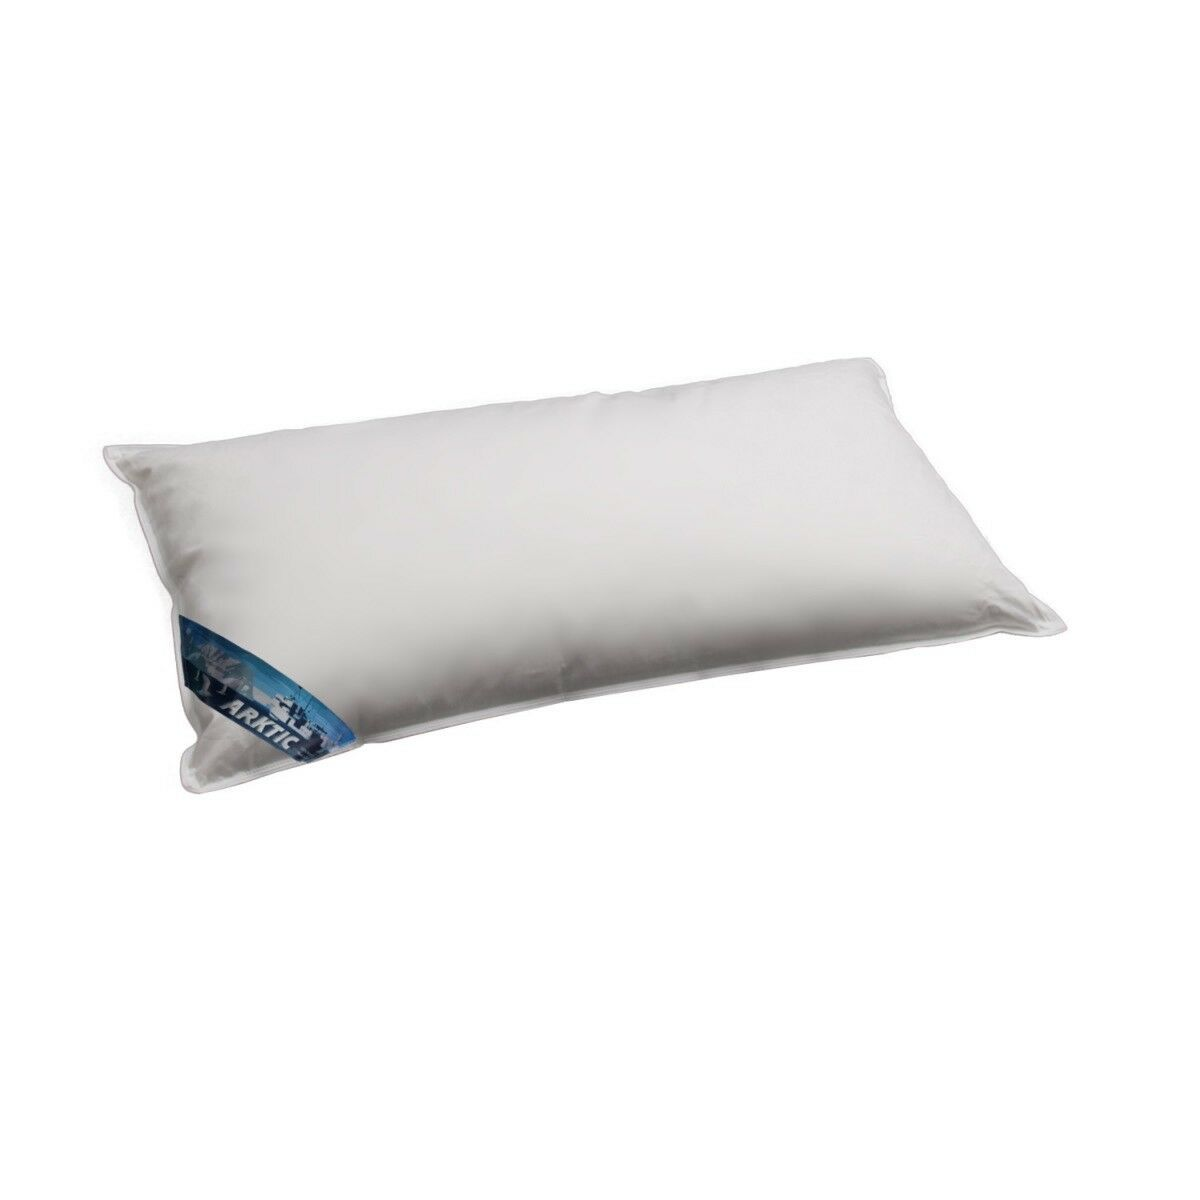 ARKTIC Daunenkissen arktischer Daunenflaum 100 % Daunen 40x80 cm Weißh NEU